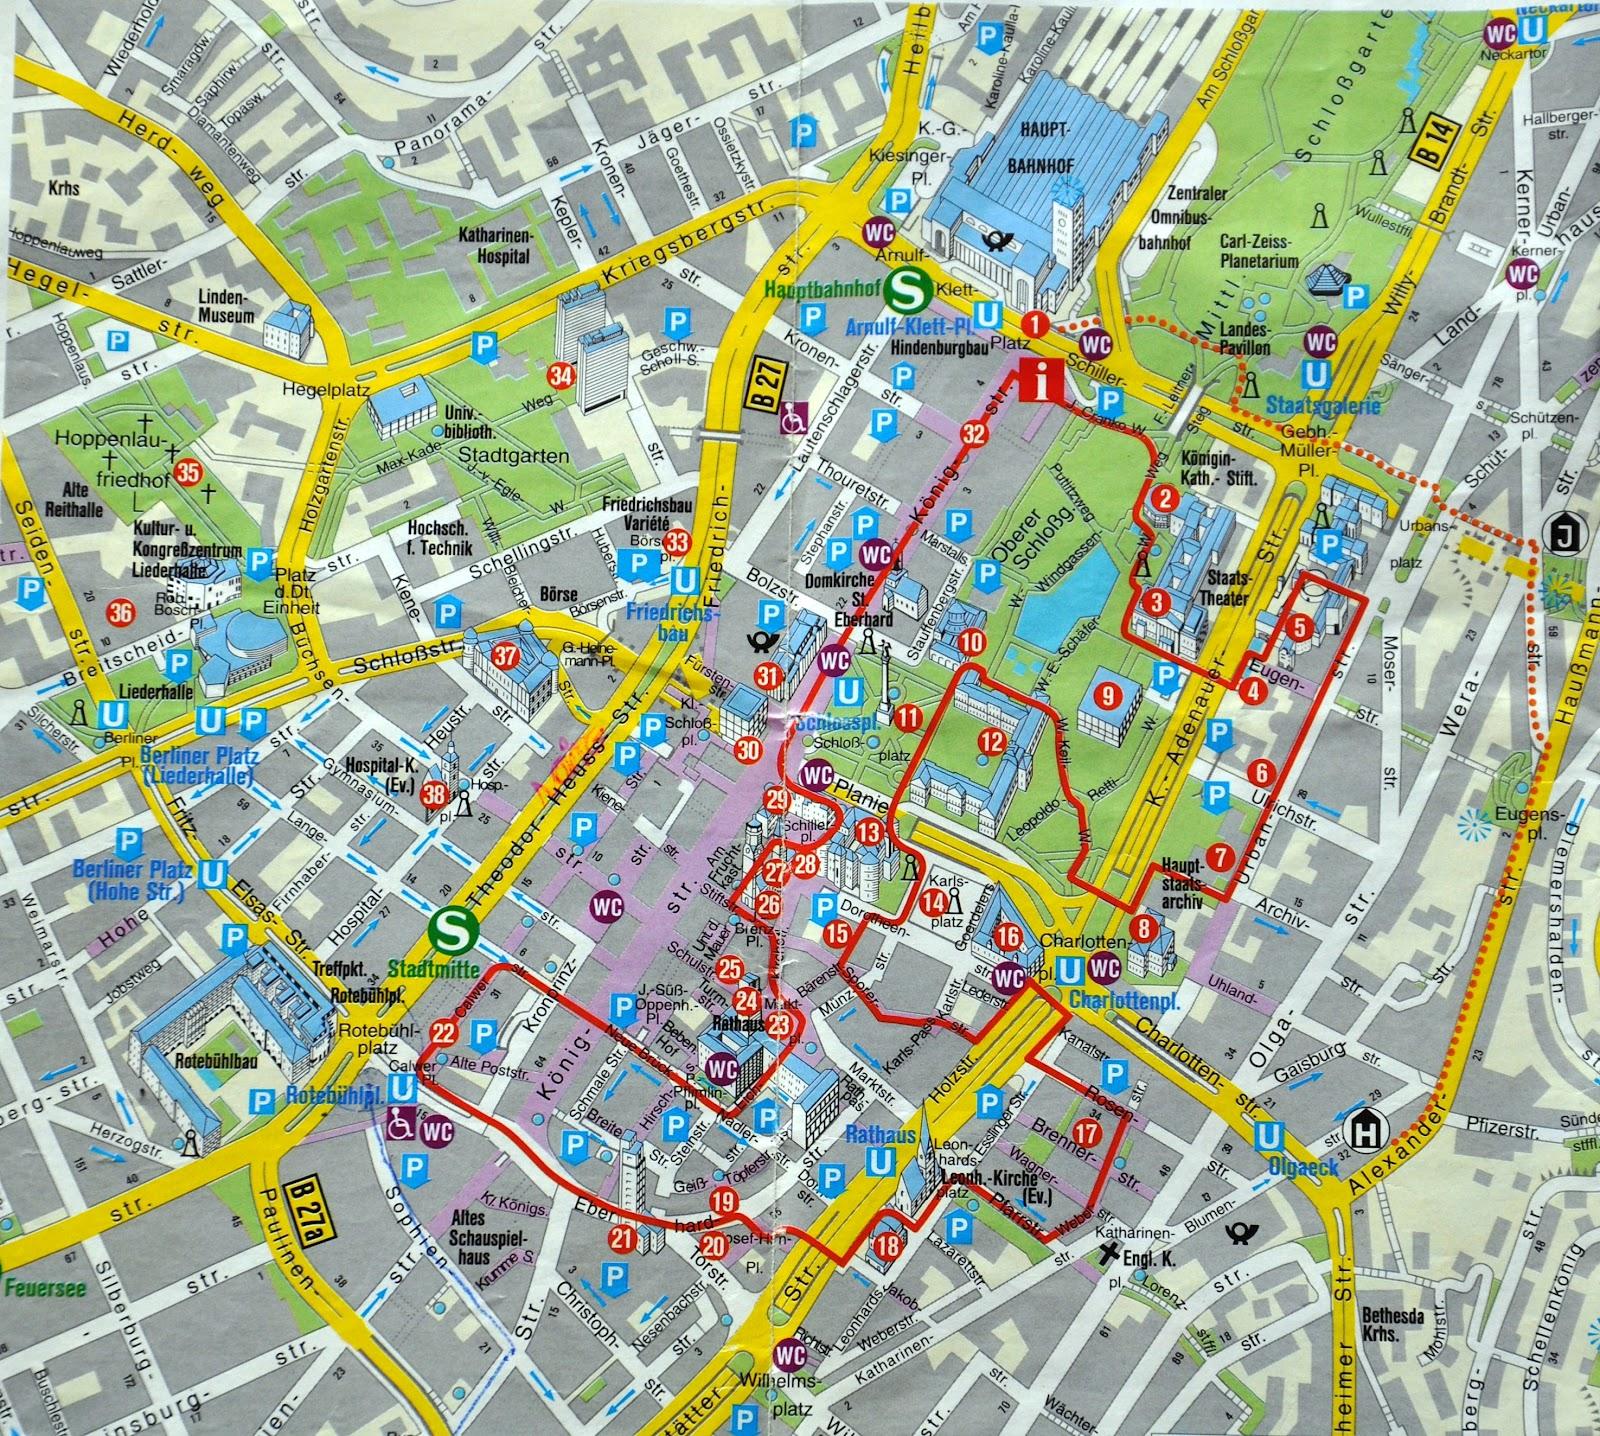 mapa de estugarda NOSSAS VIAGENS: Stuttgart   Alemanha   Schloßgarten III mapa de estugarda